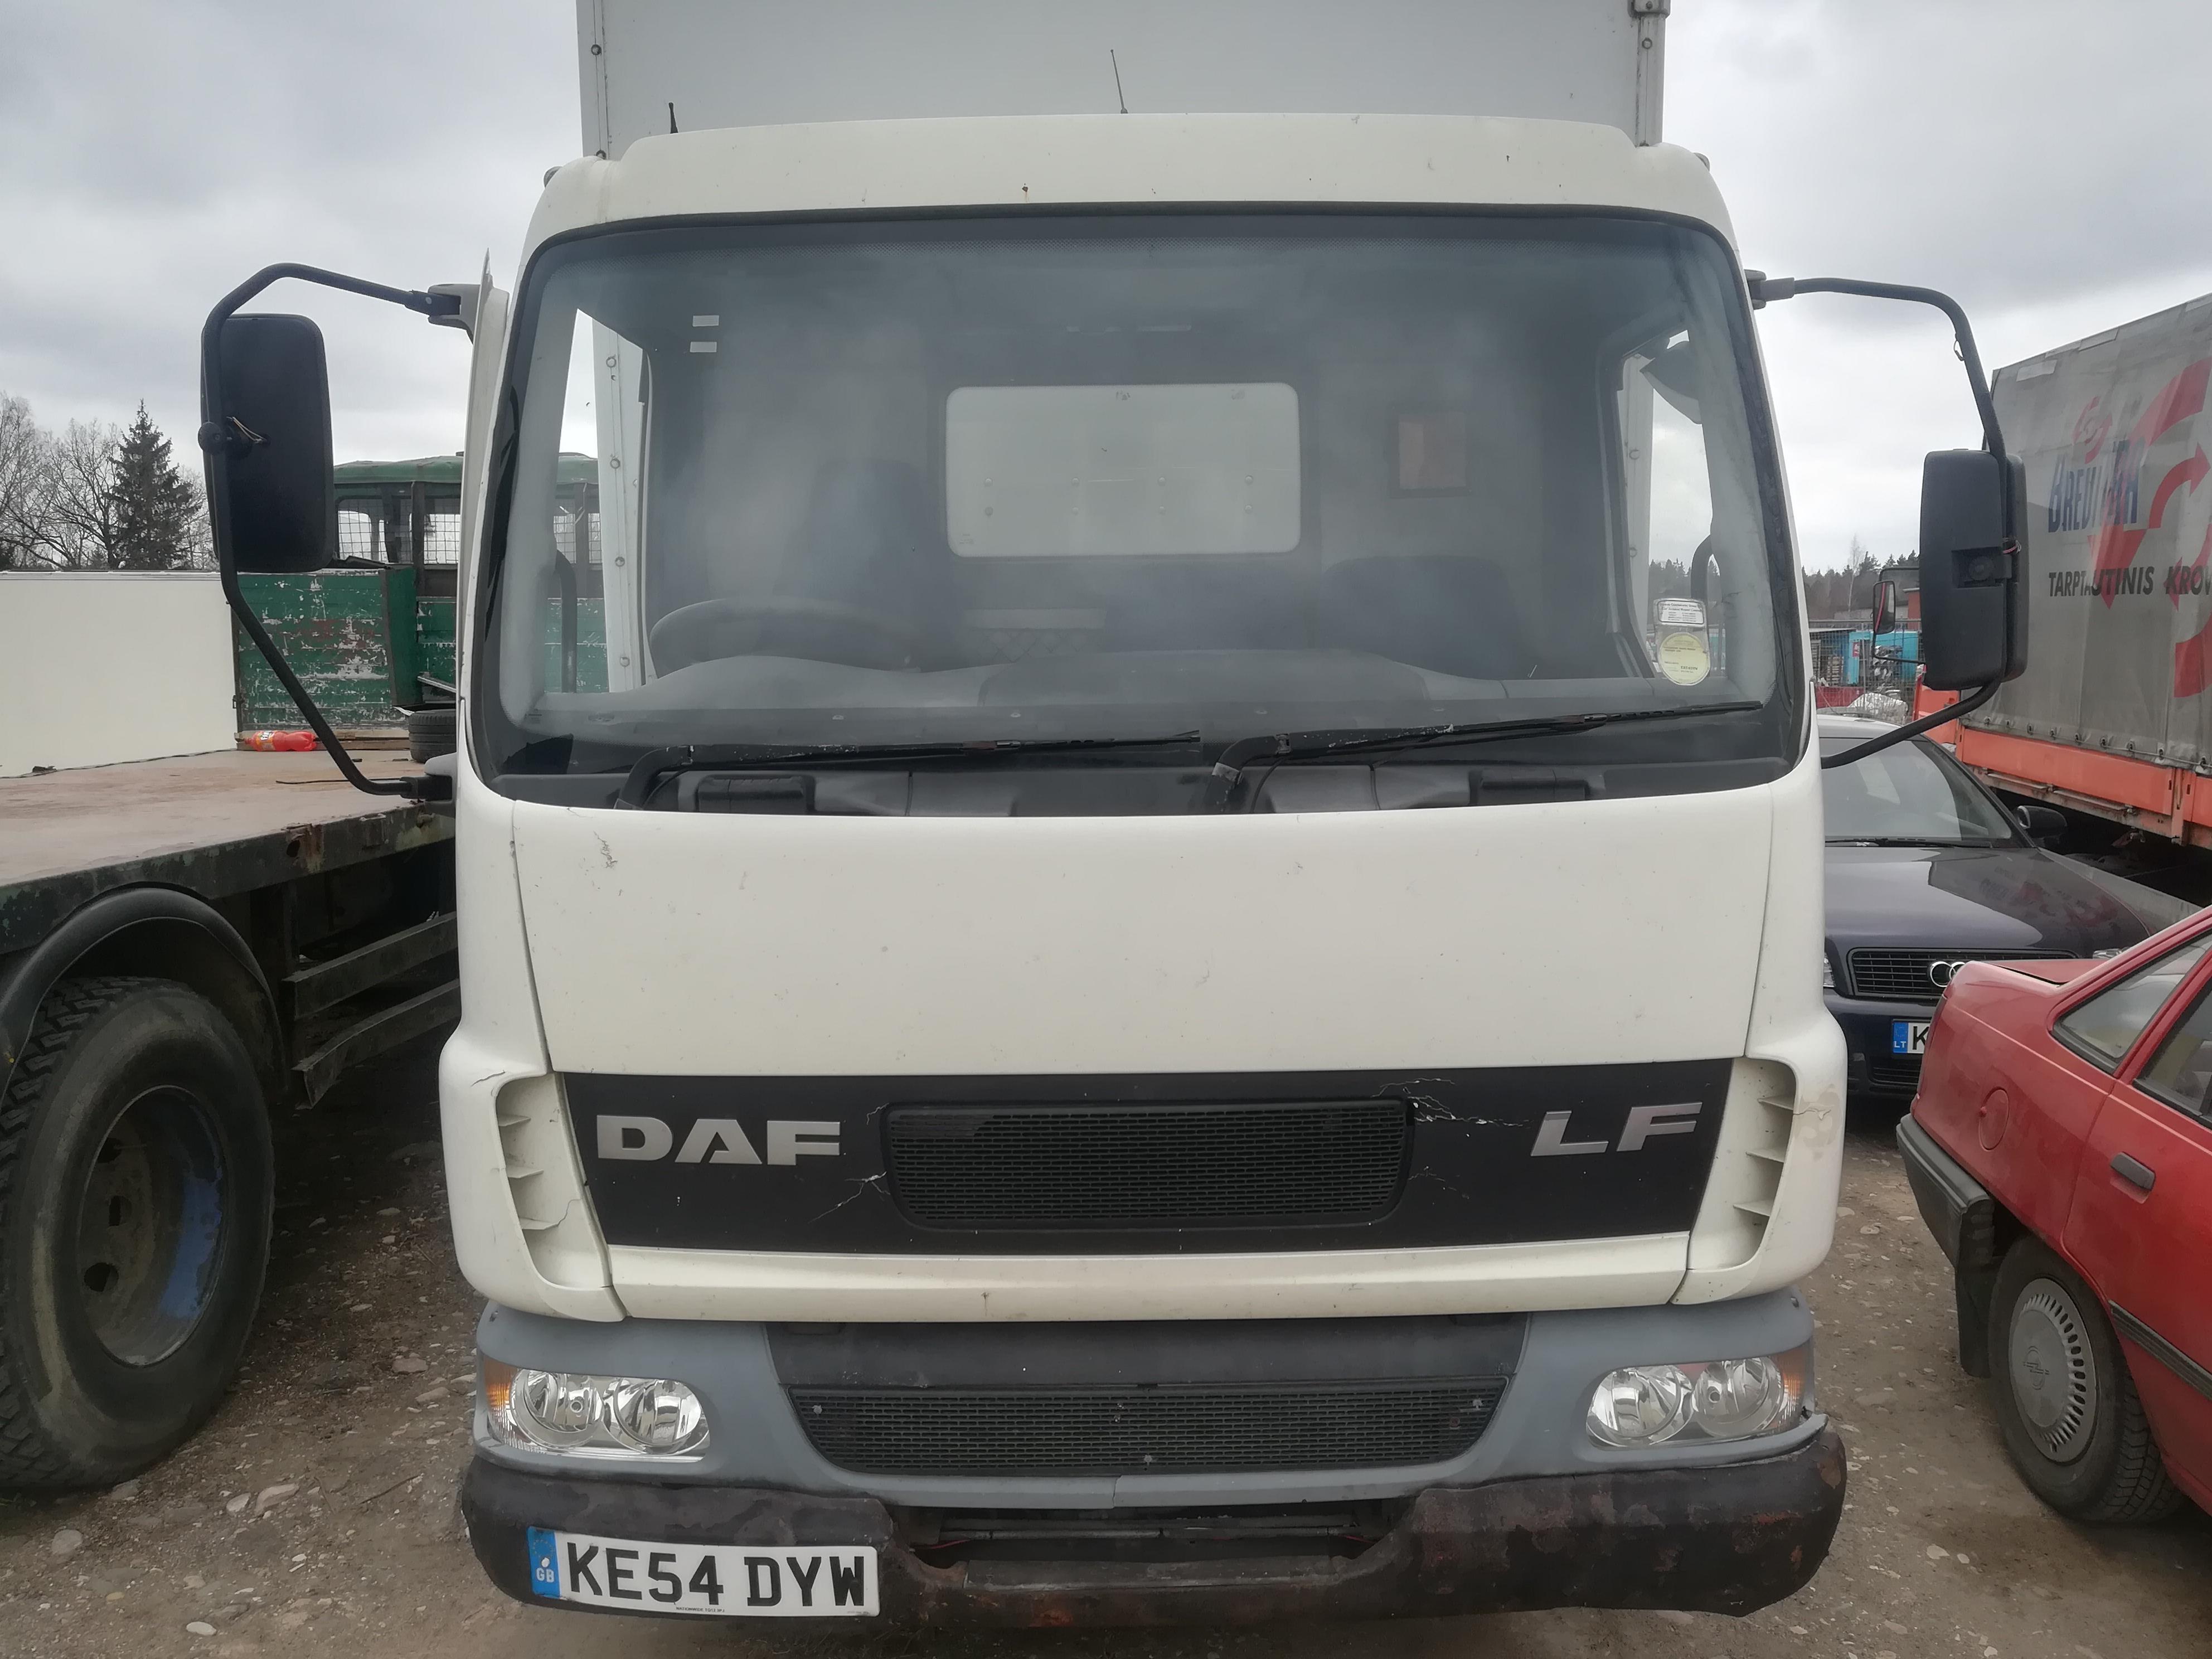 Naudotos automobilio dalys Truck - DAF LF 2004 3.2 Mechaninė Vilkikas 2/3 d. Balta 2019-4-11